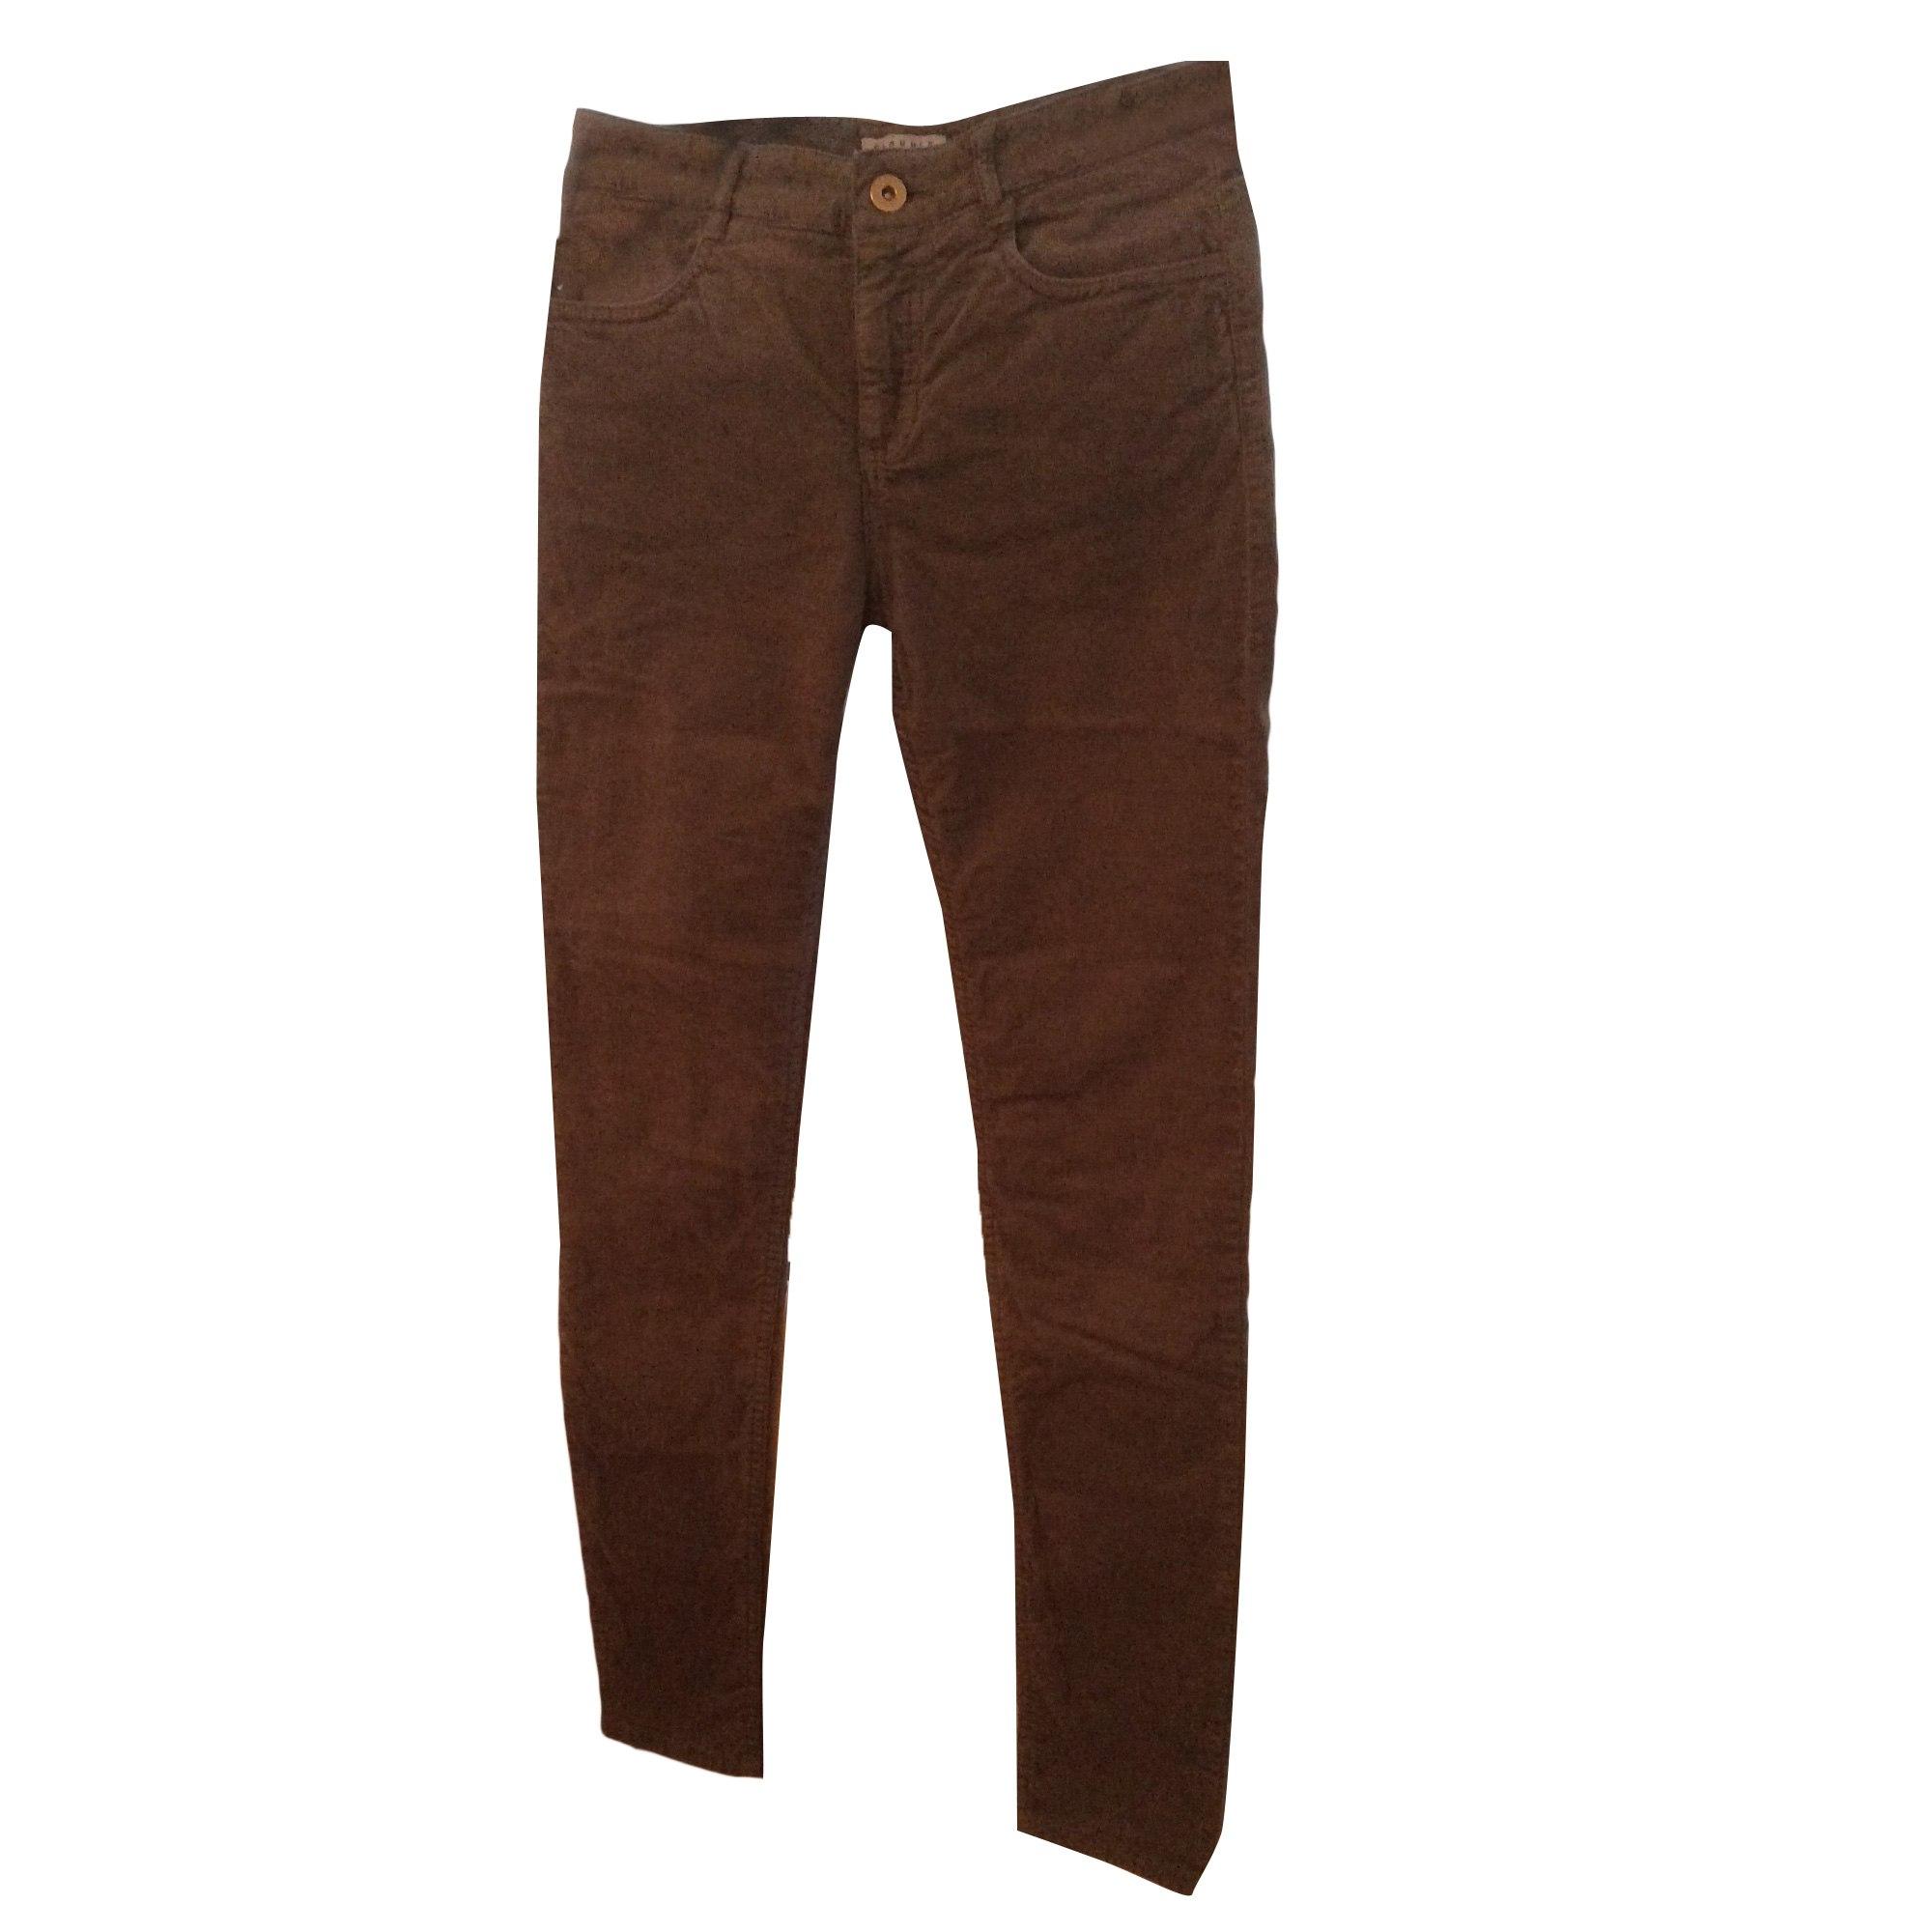 Pantalon slim, cigarette CLAUDIE PIERLOT Gris, anthracite